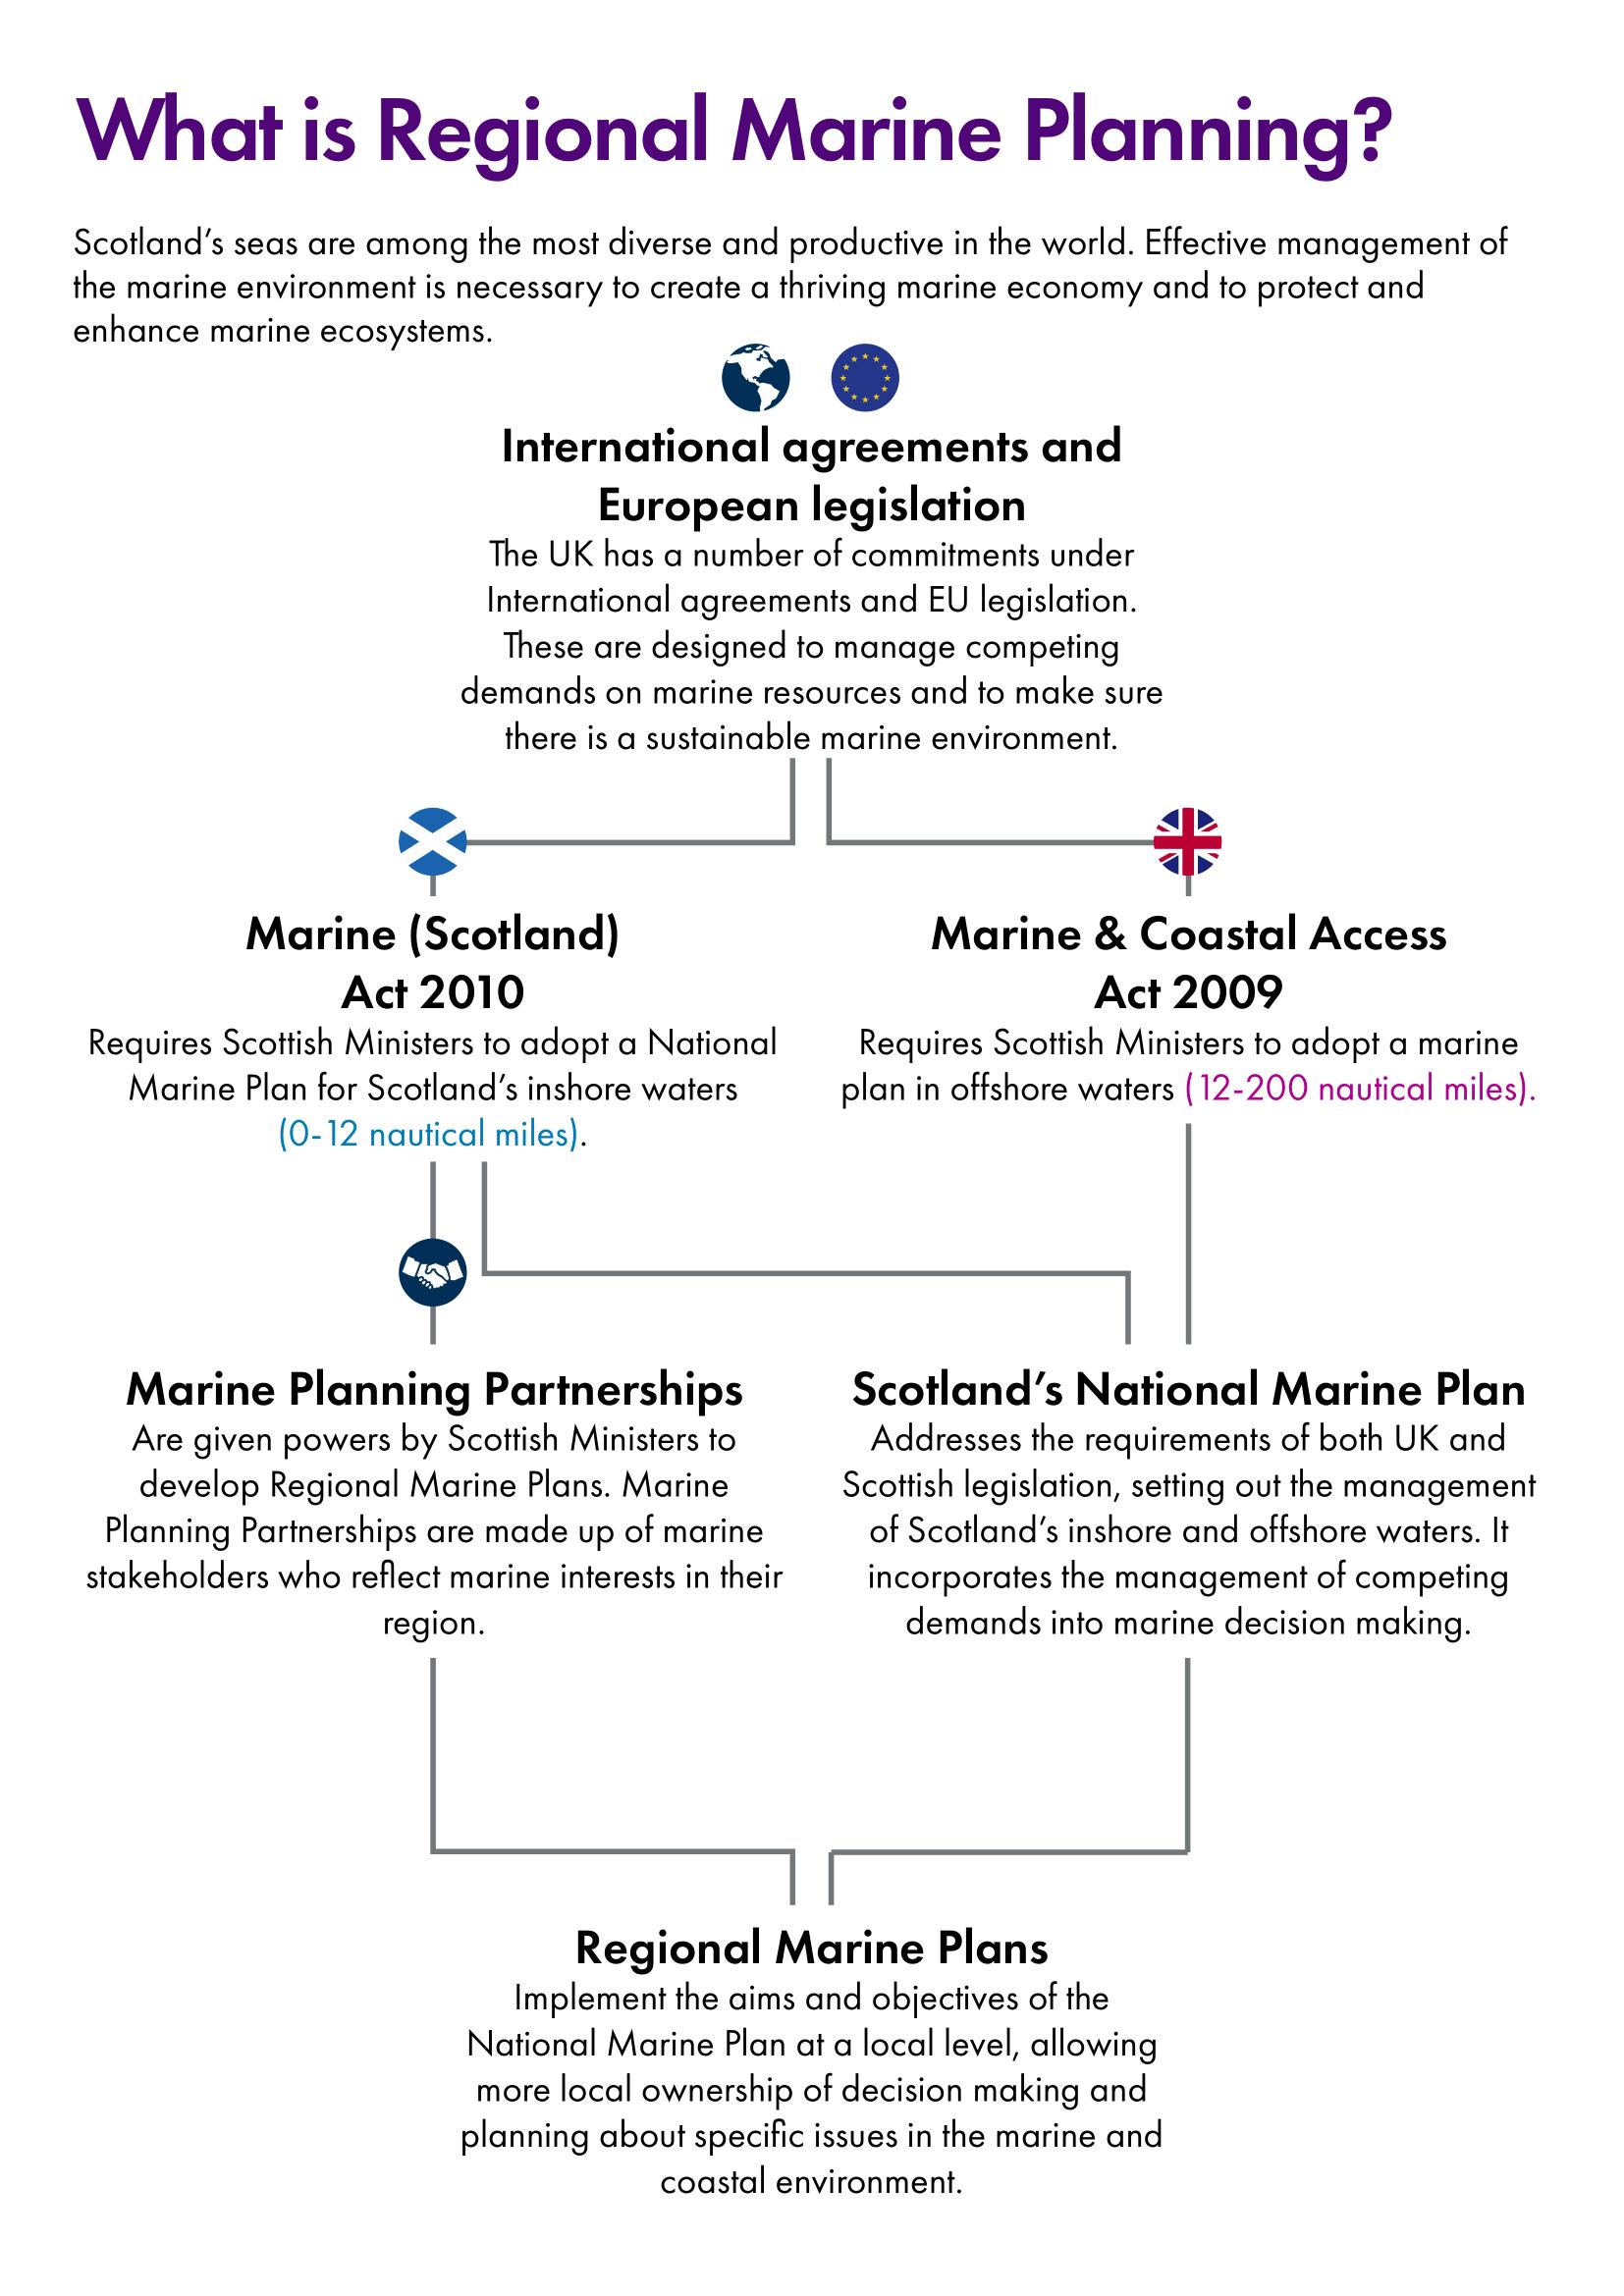 Regional Marine Planning process